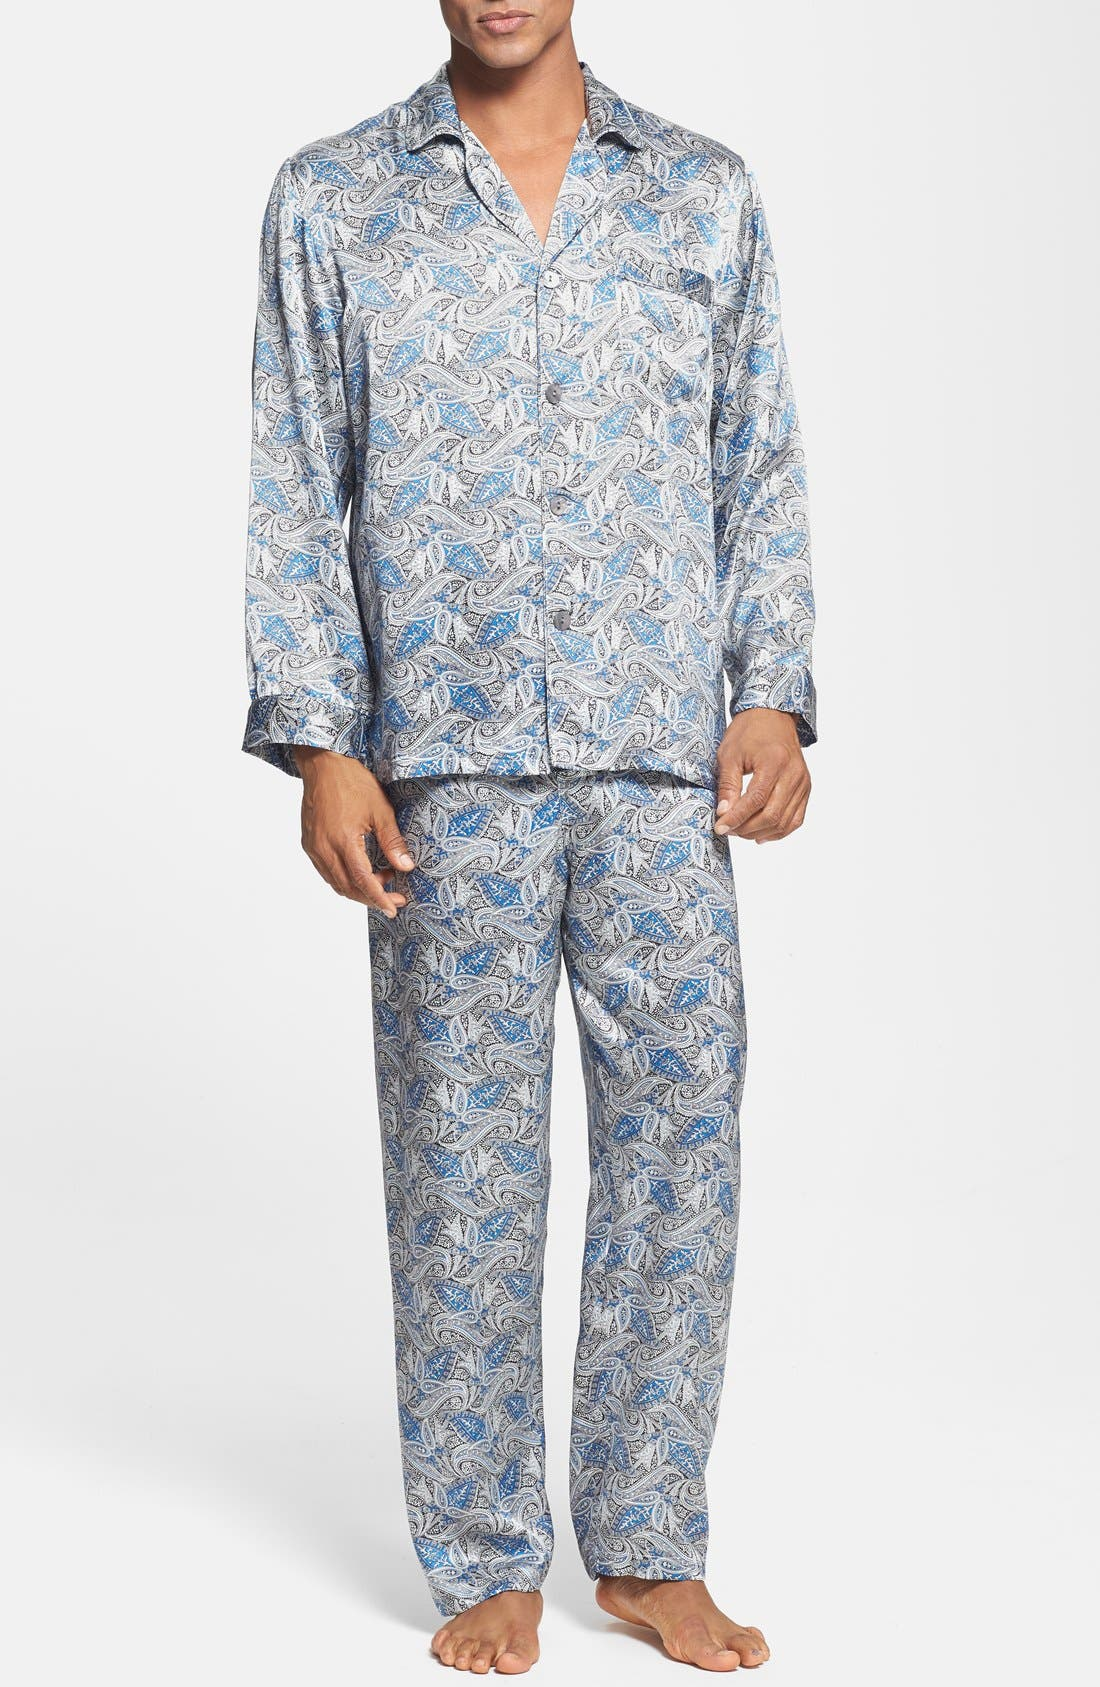 1930s Men's Fashion Guide- What Did Men Wear? Mens Majestic International Cypress Silk Pajamas Size XX-Large - Blue $325.00 AT vintagedancer.com